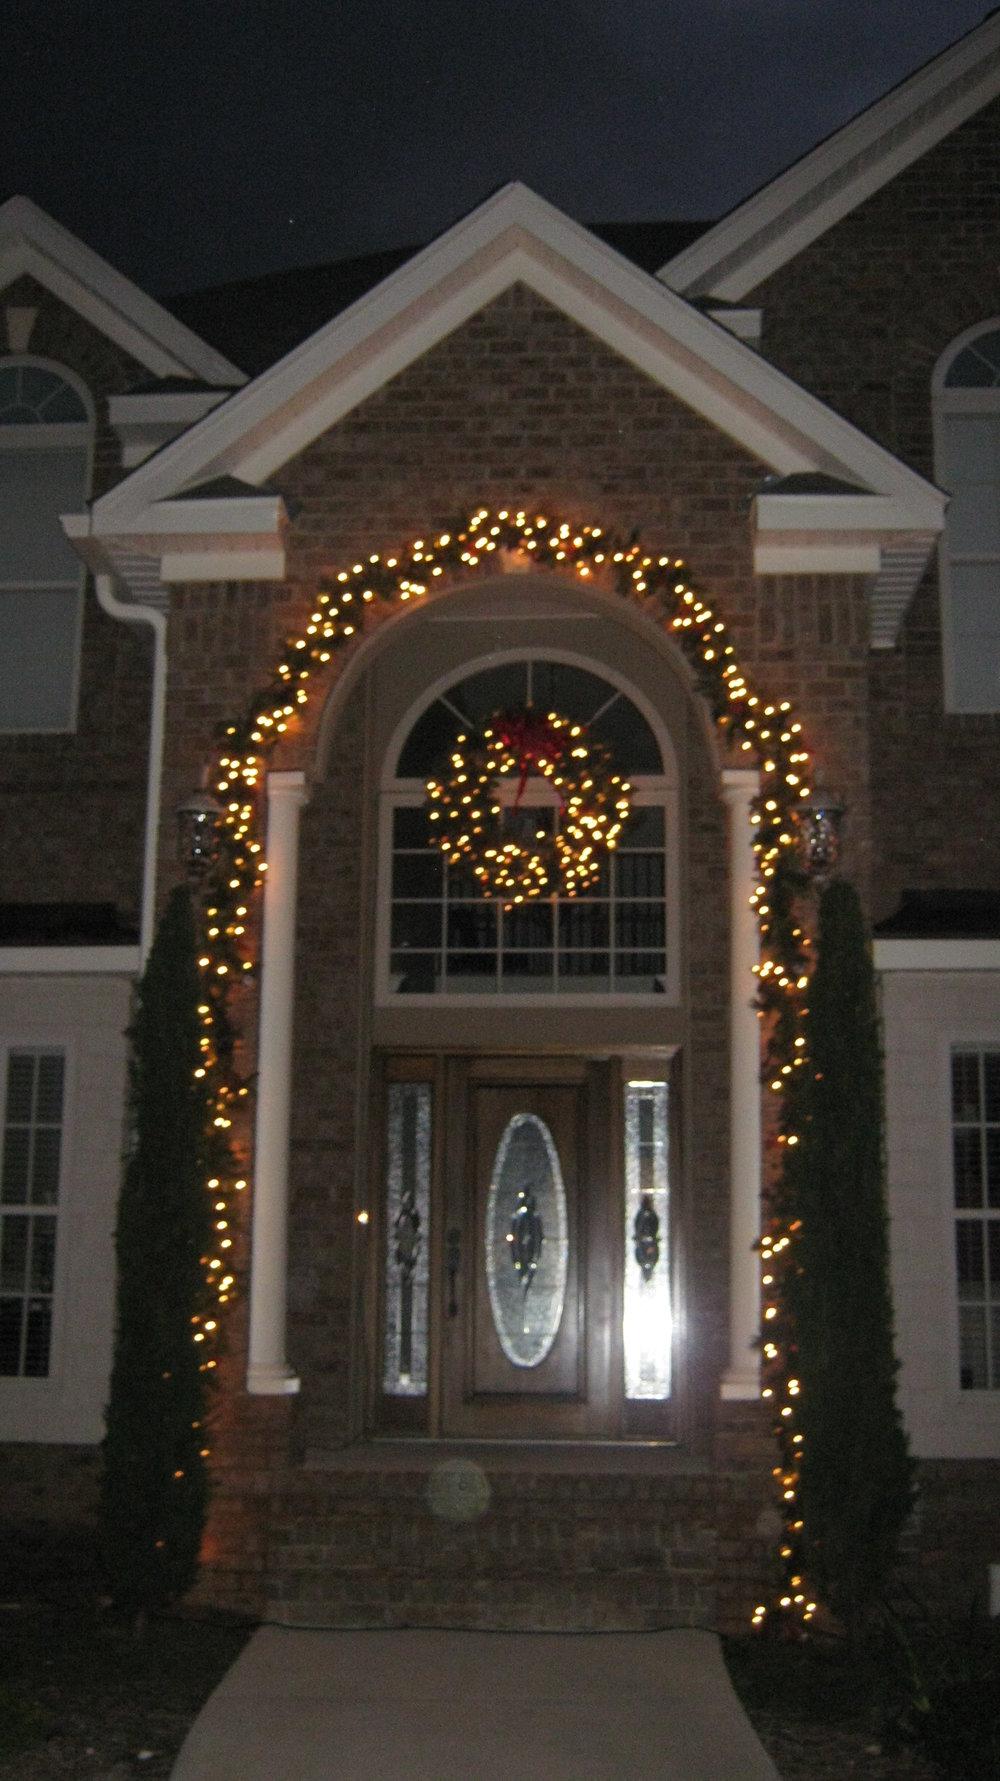 glitter and glow chrismas decor residential exterior (6).JPG